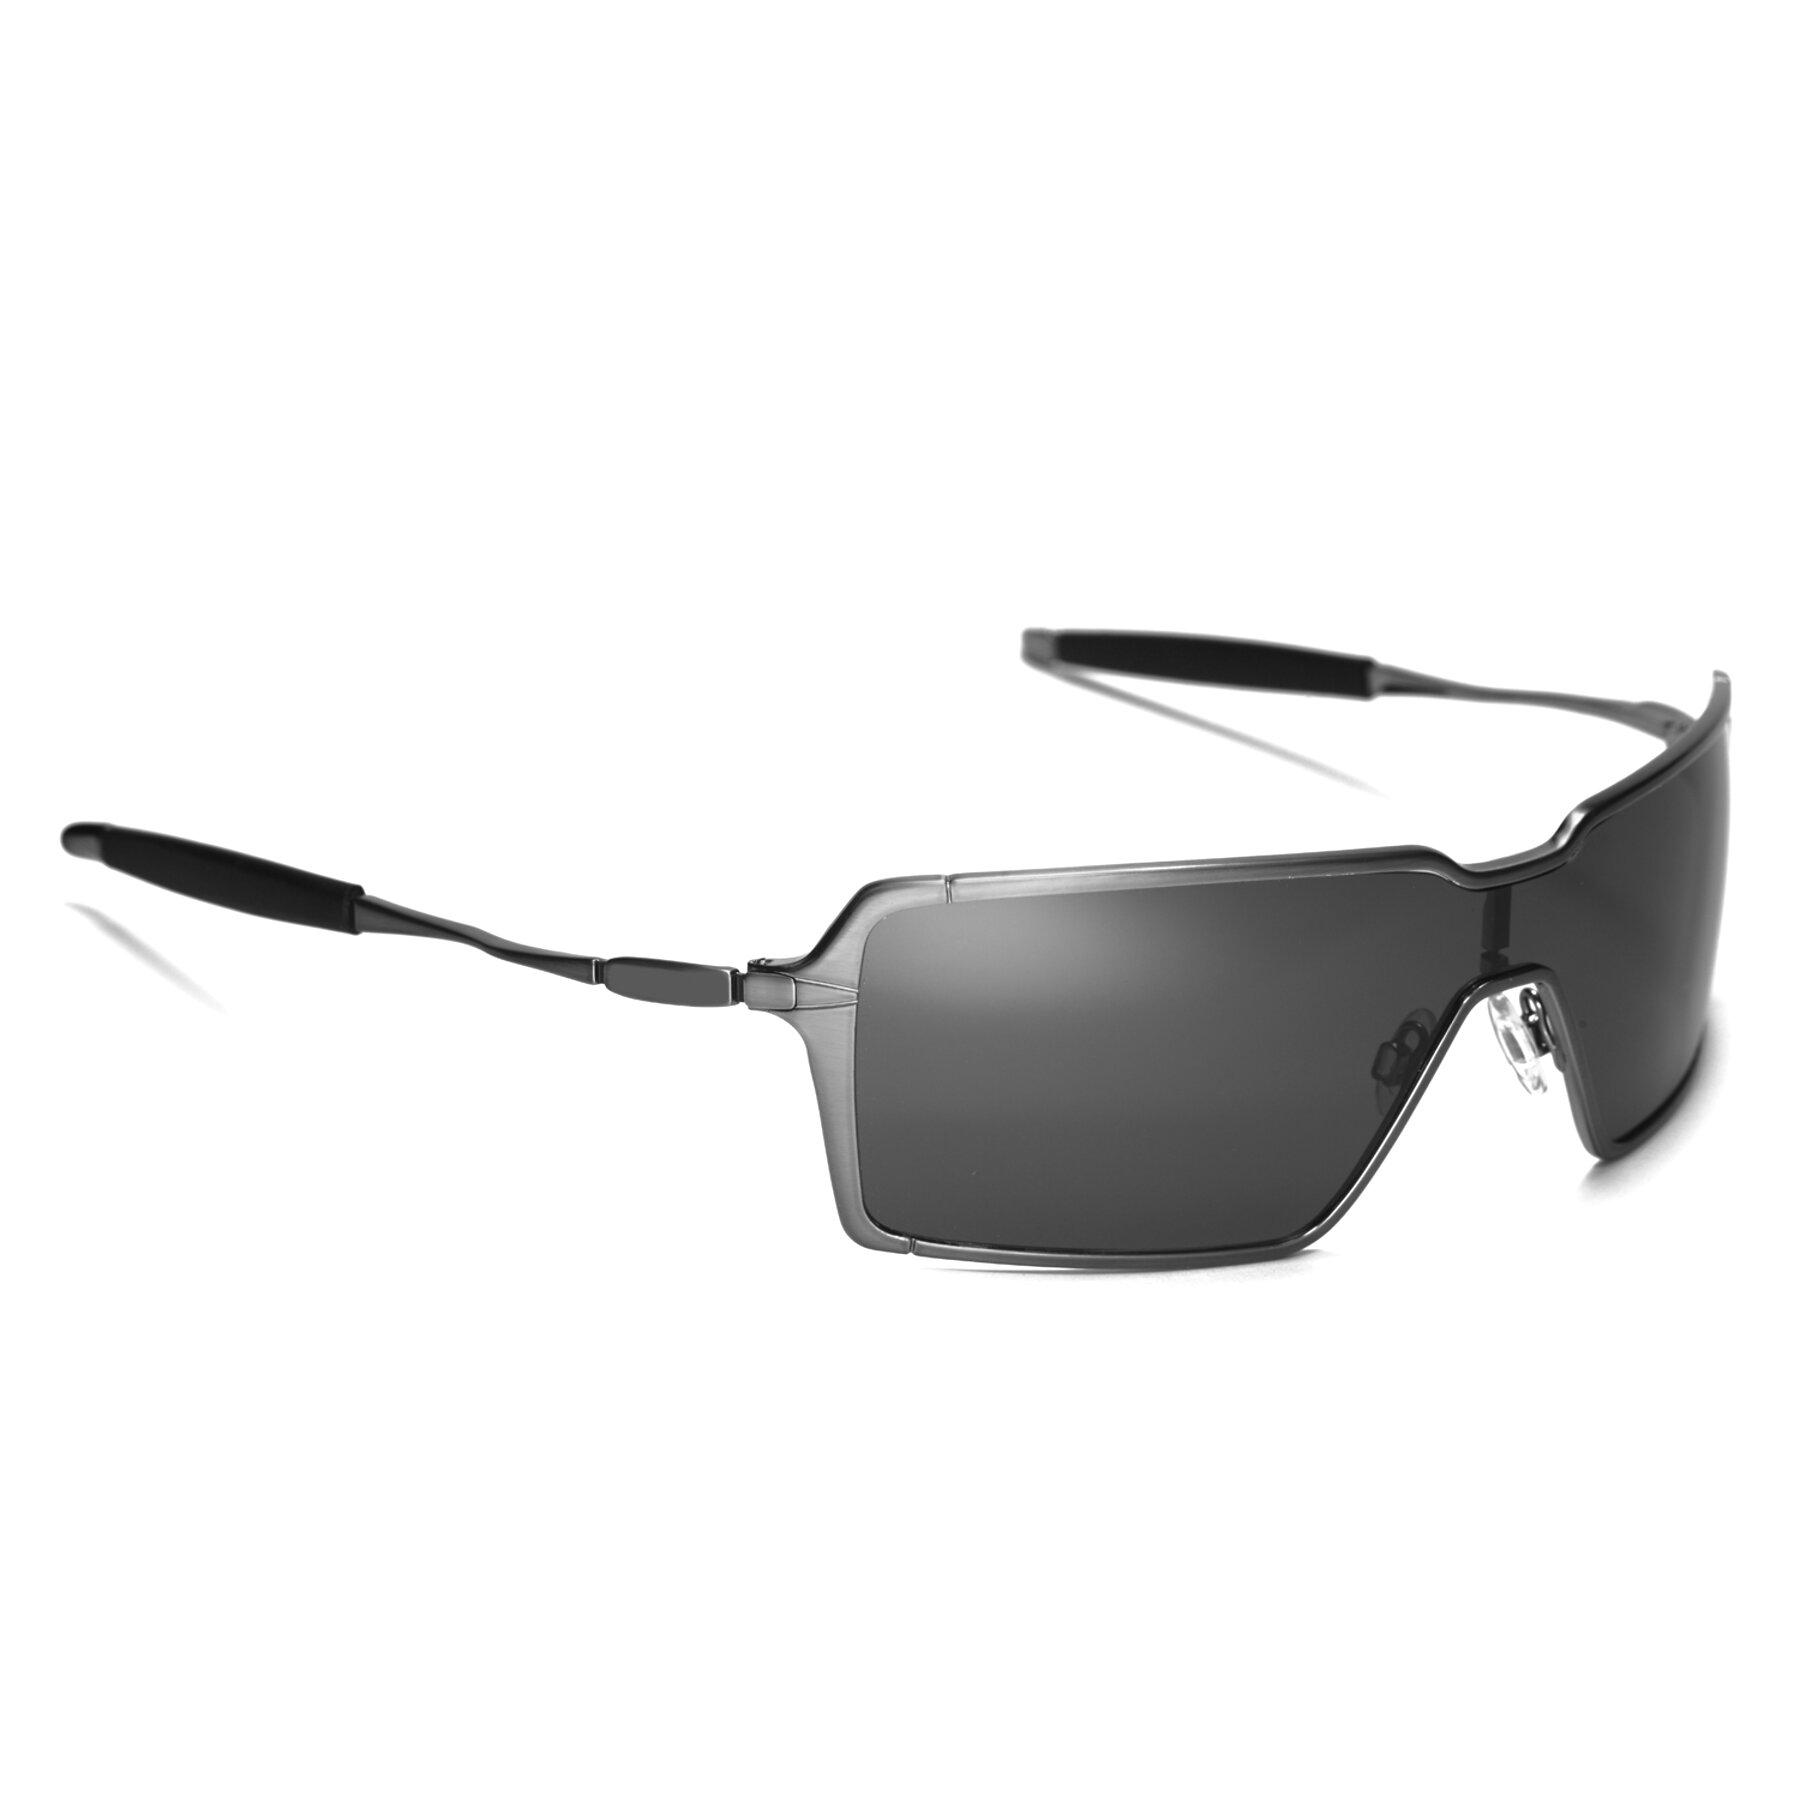 oakley probation sunglasses for sale